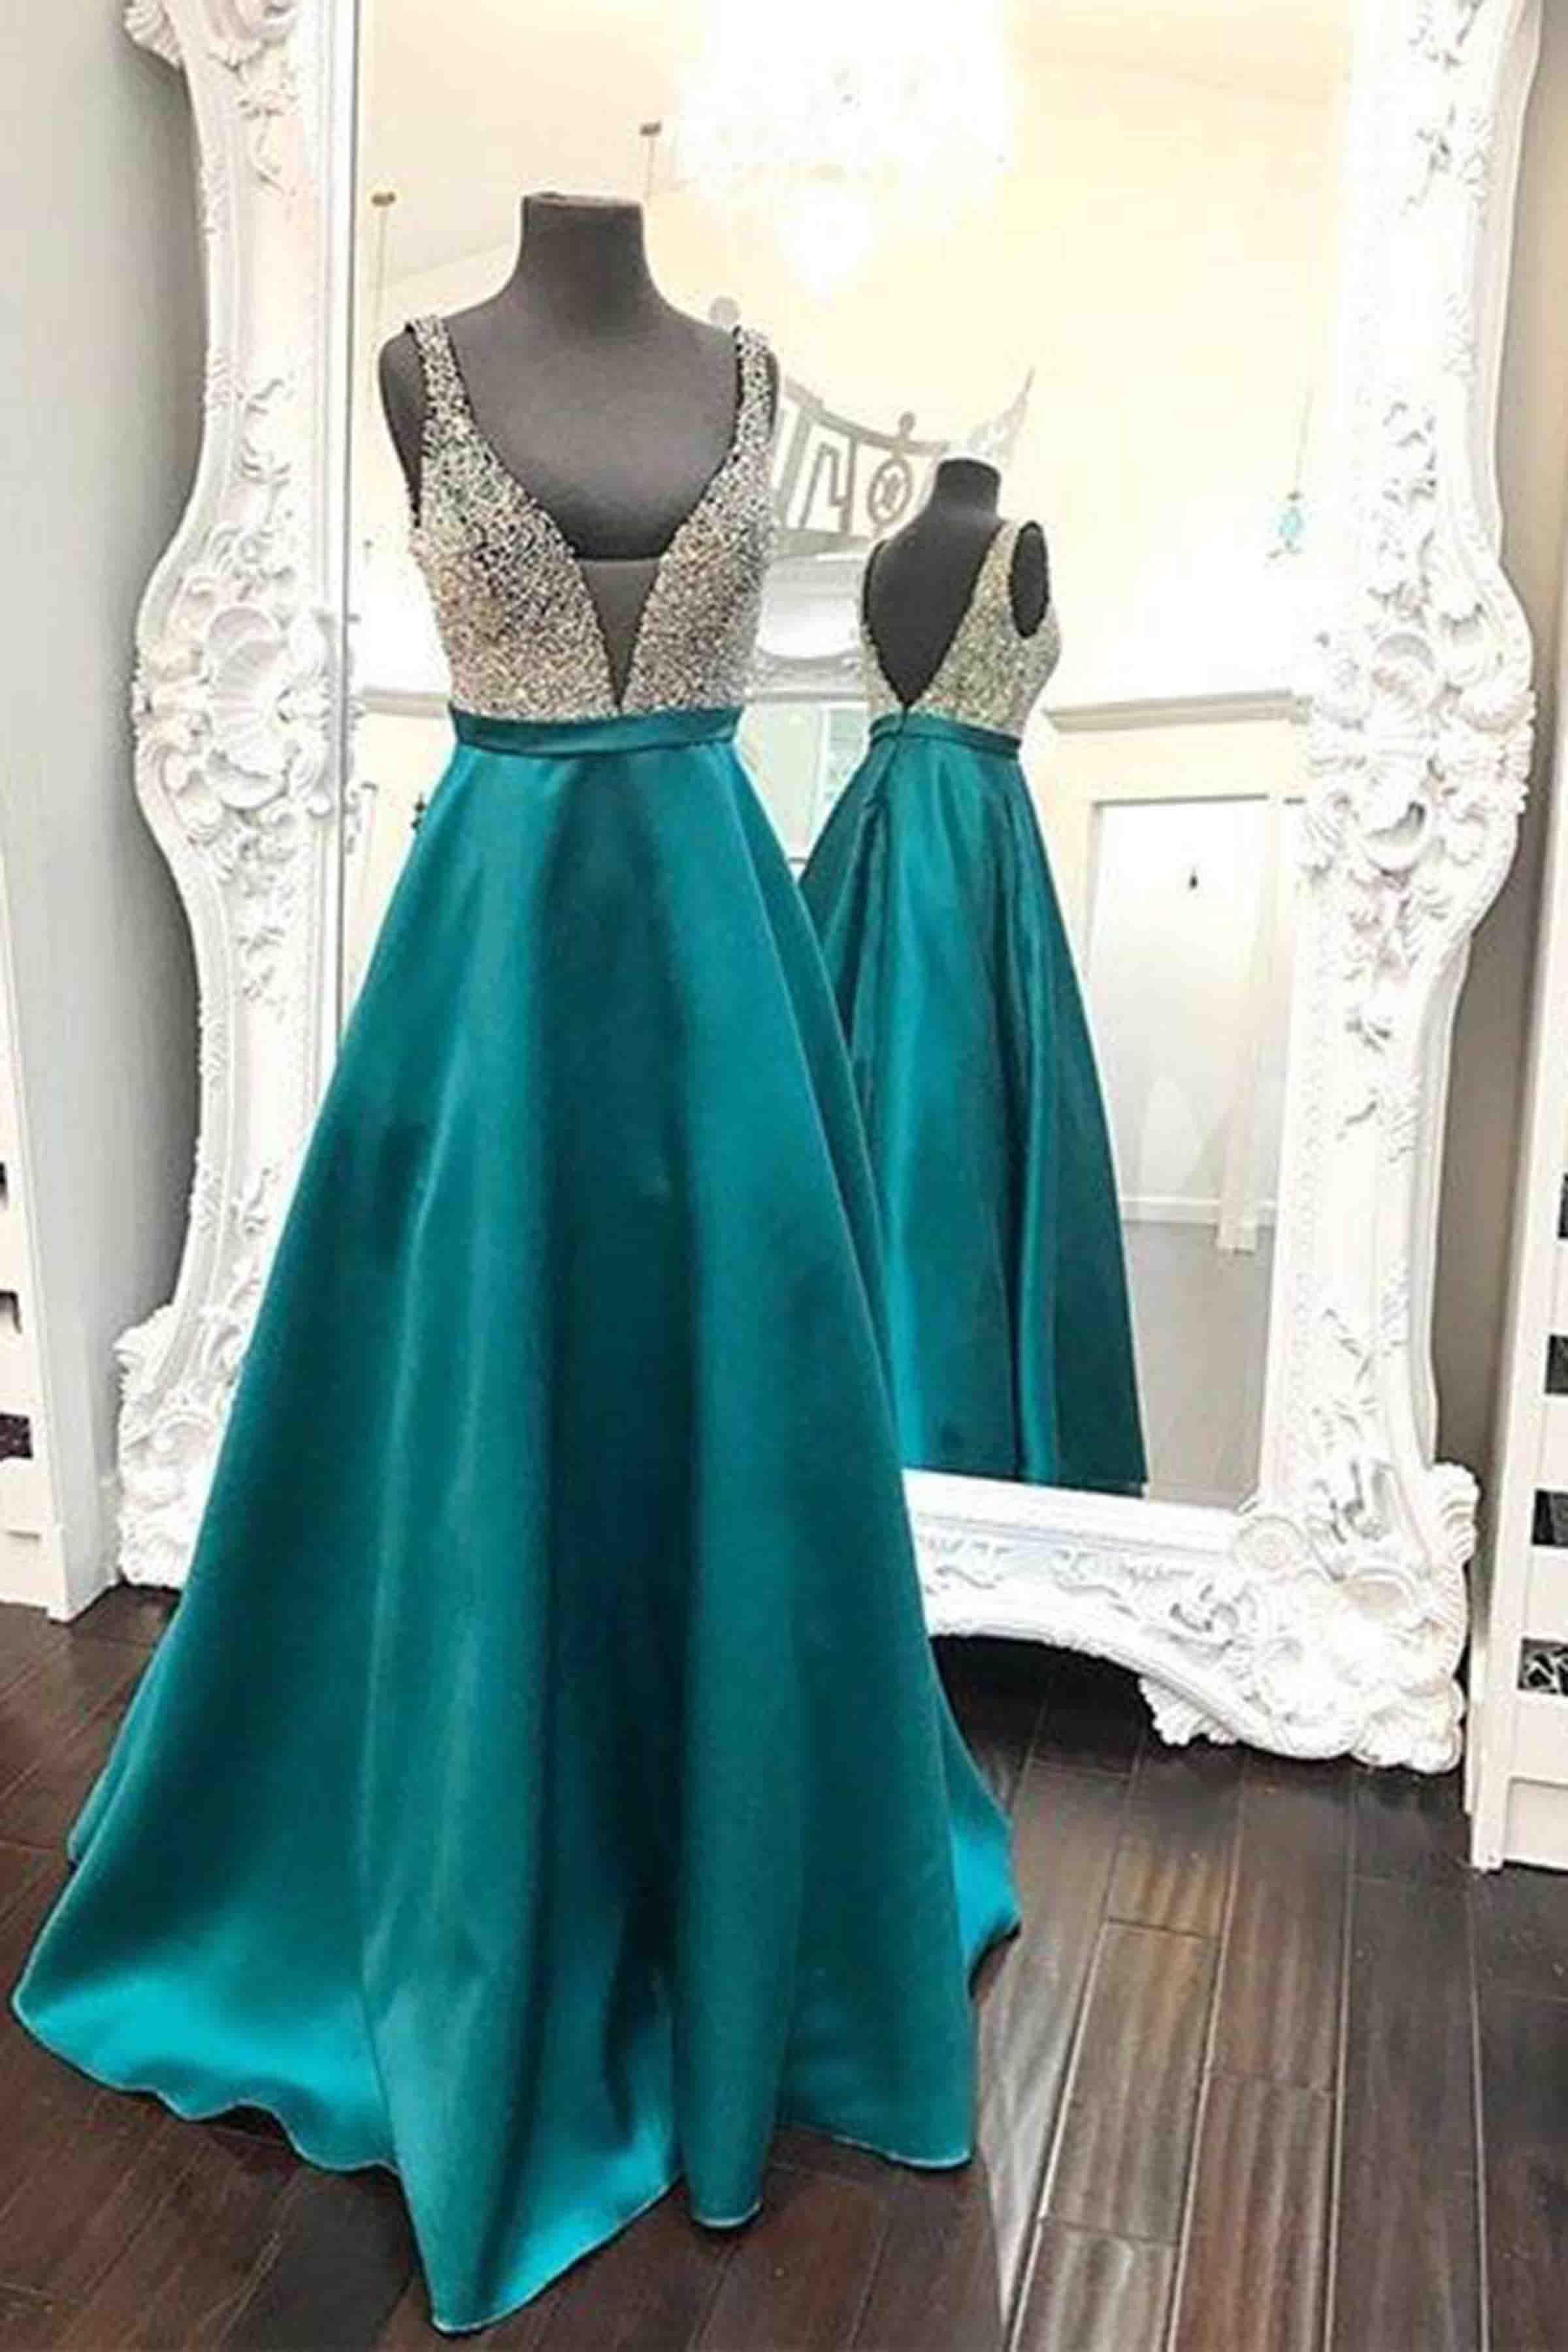 Malachite green satin prom dress, v-neck prom dress, cute sequin ...